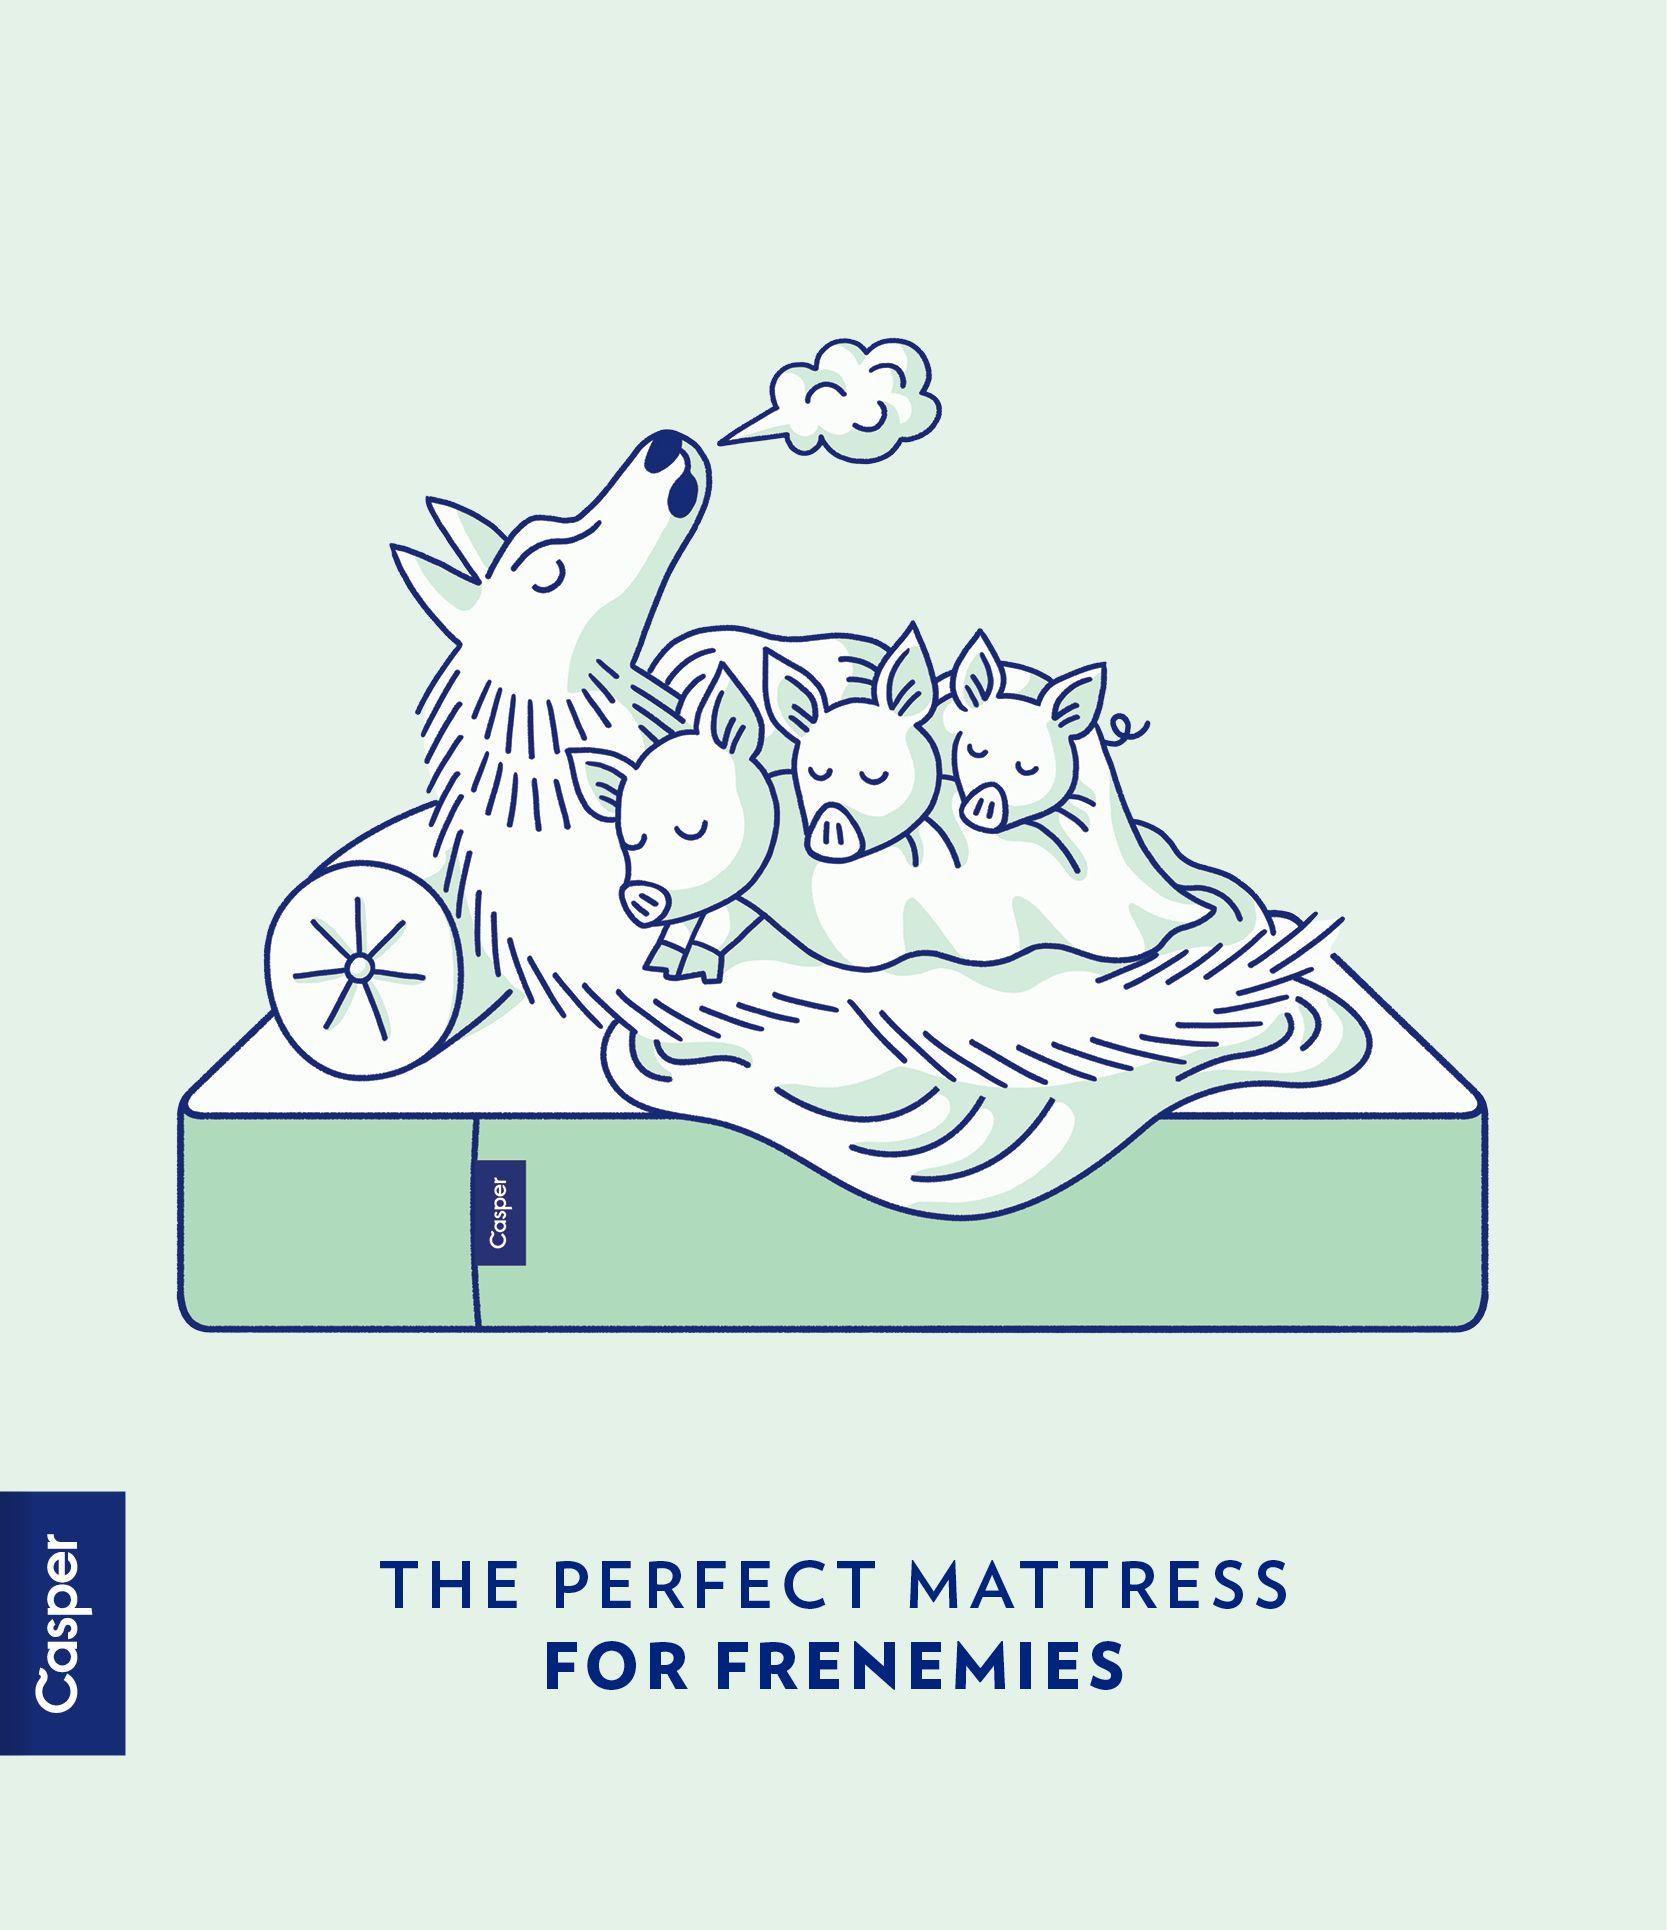 Casper the perfect mattress for frenemies. Casper